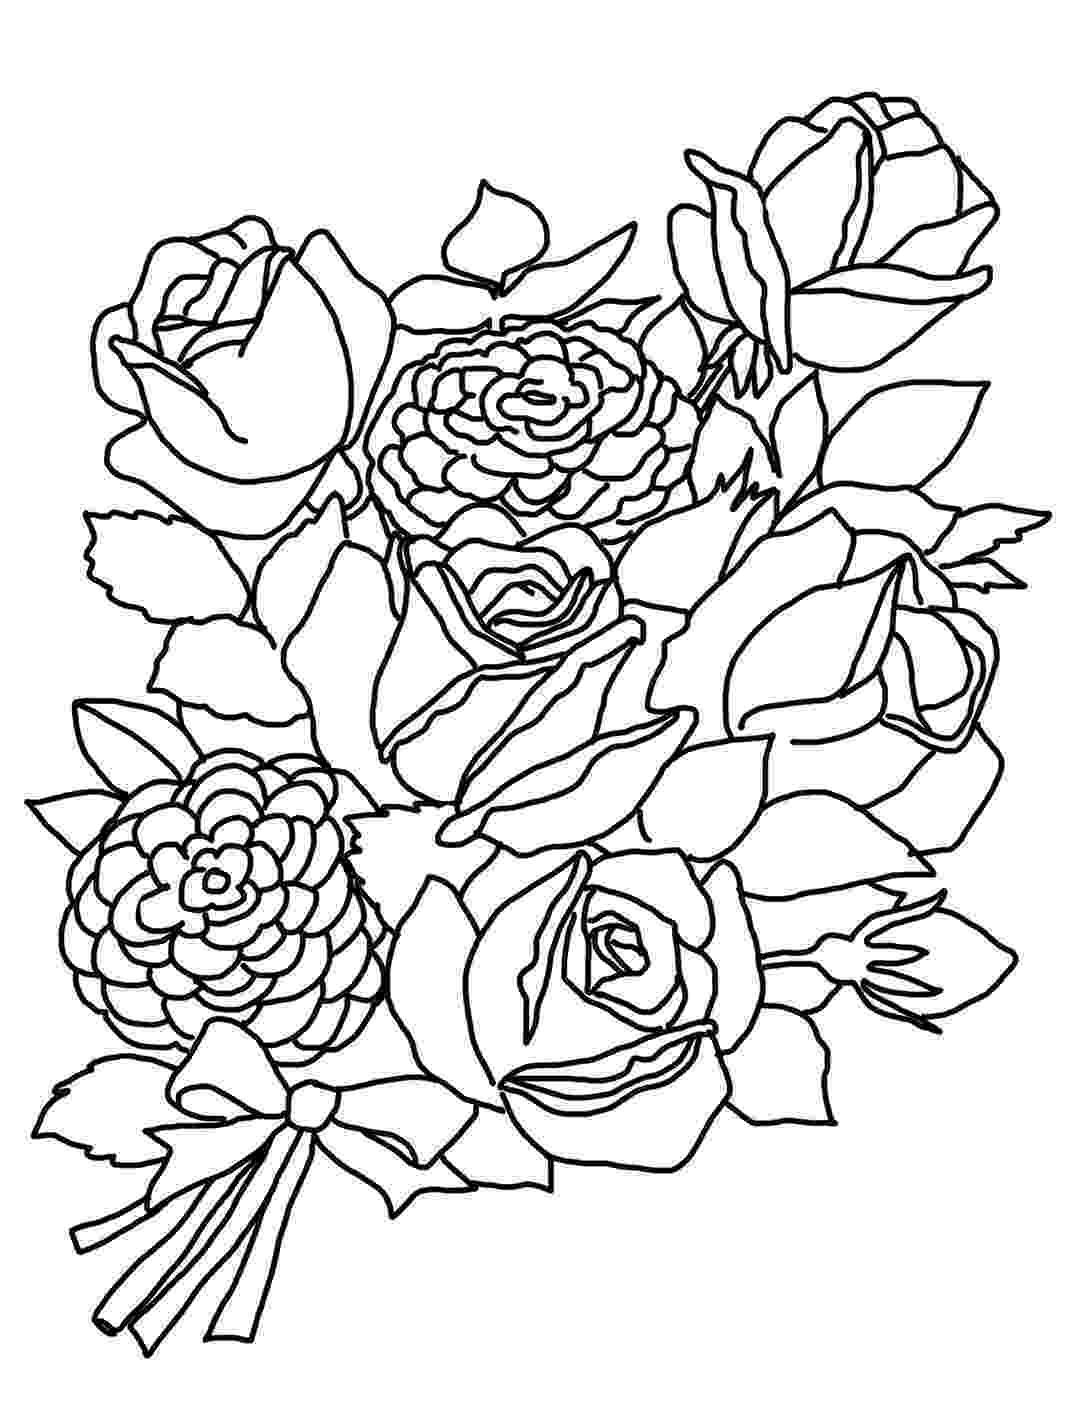 rose coloring sheets coloring lab sheets rose coloring